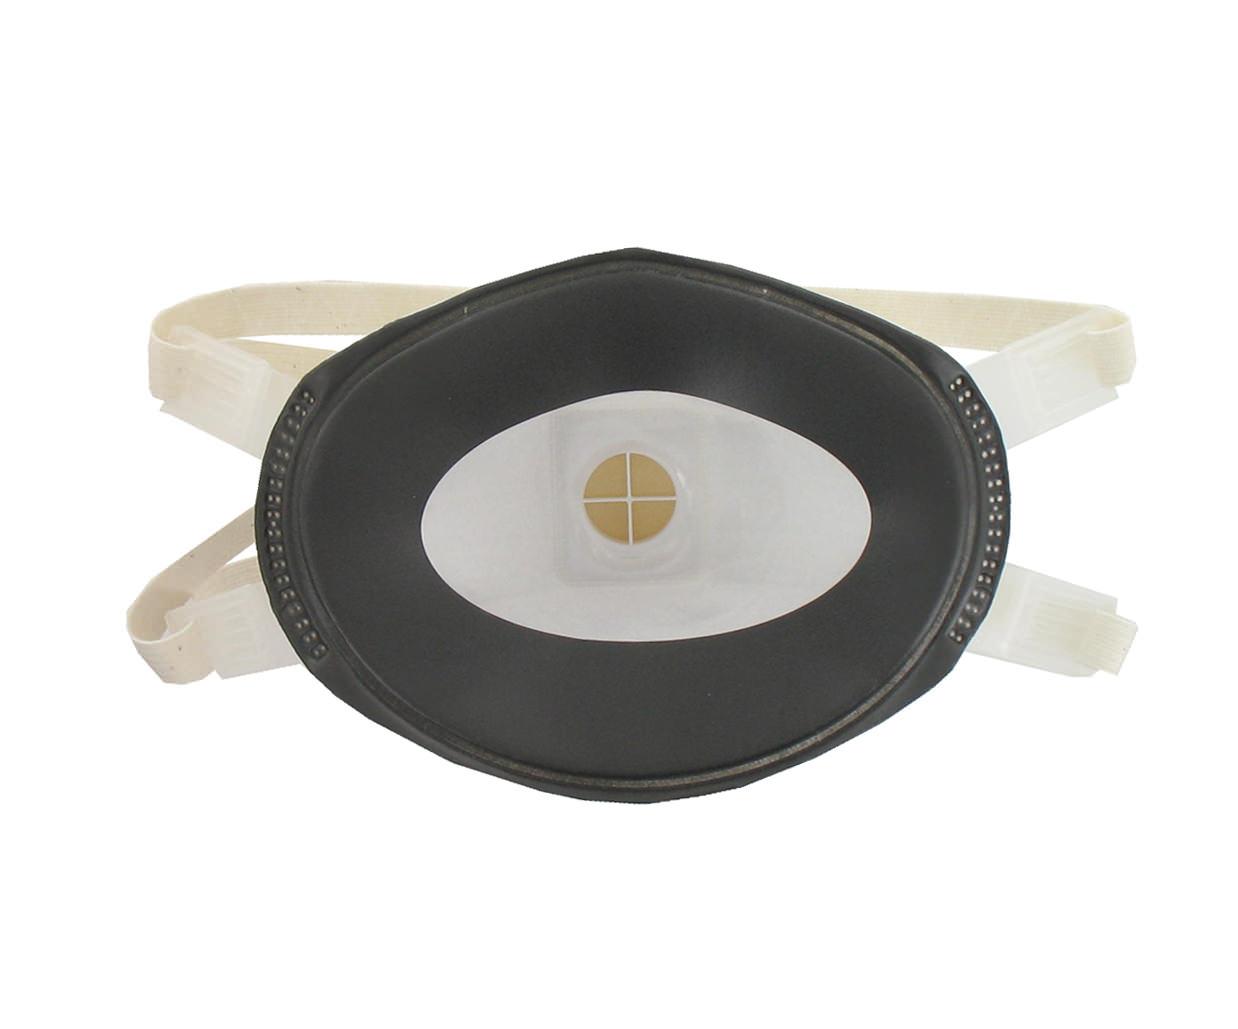 3m masque 8825 anti poussi re ffp2 avec soupape distriartisan. Black Bedroom Furniture Sets. Home Design Ideas